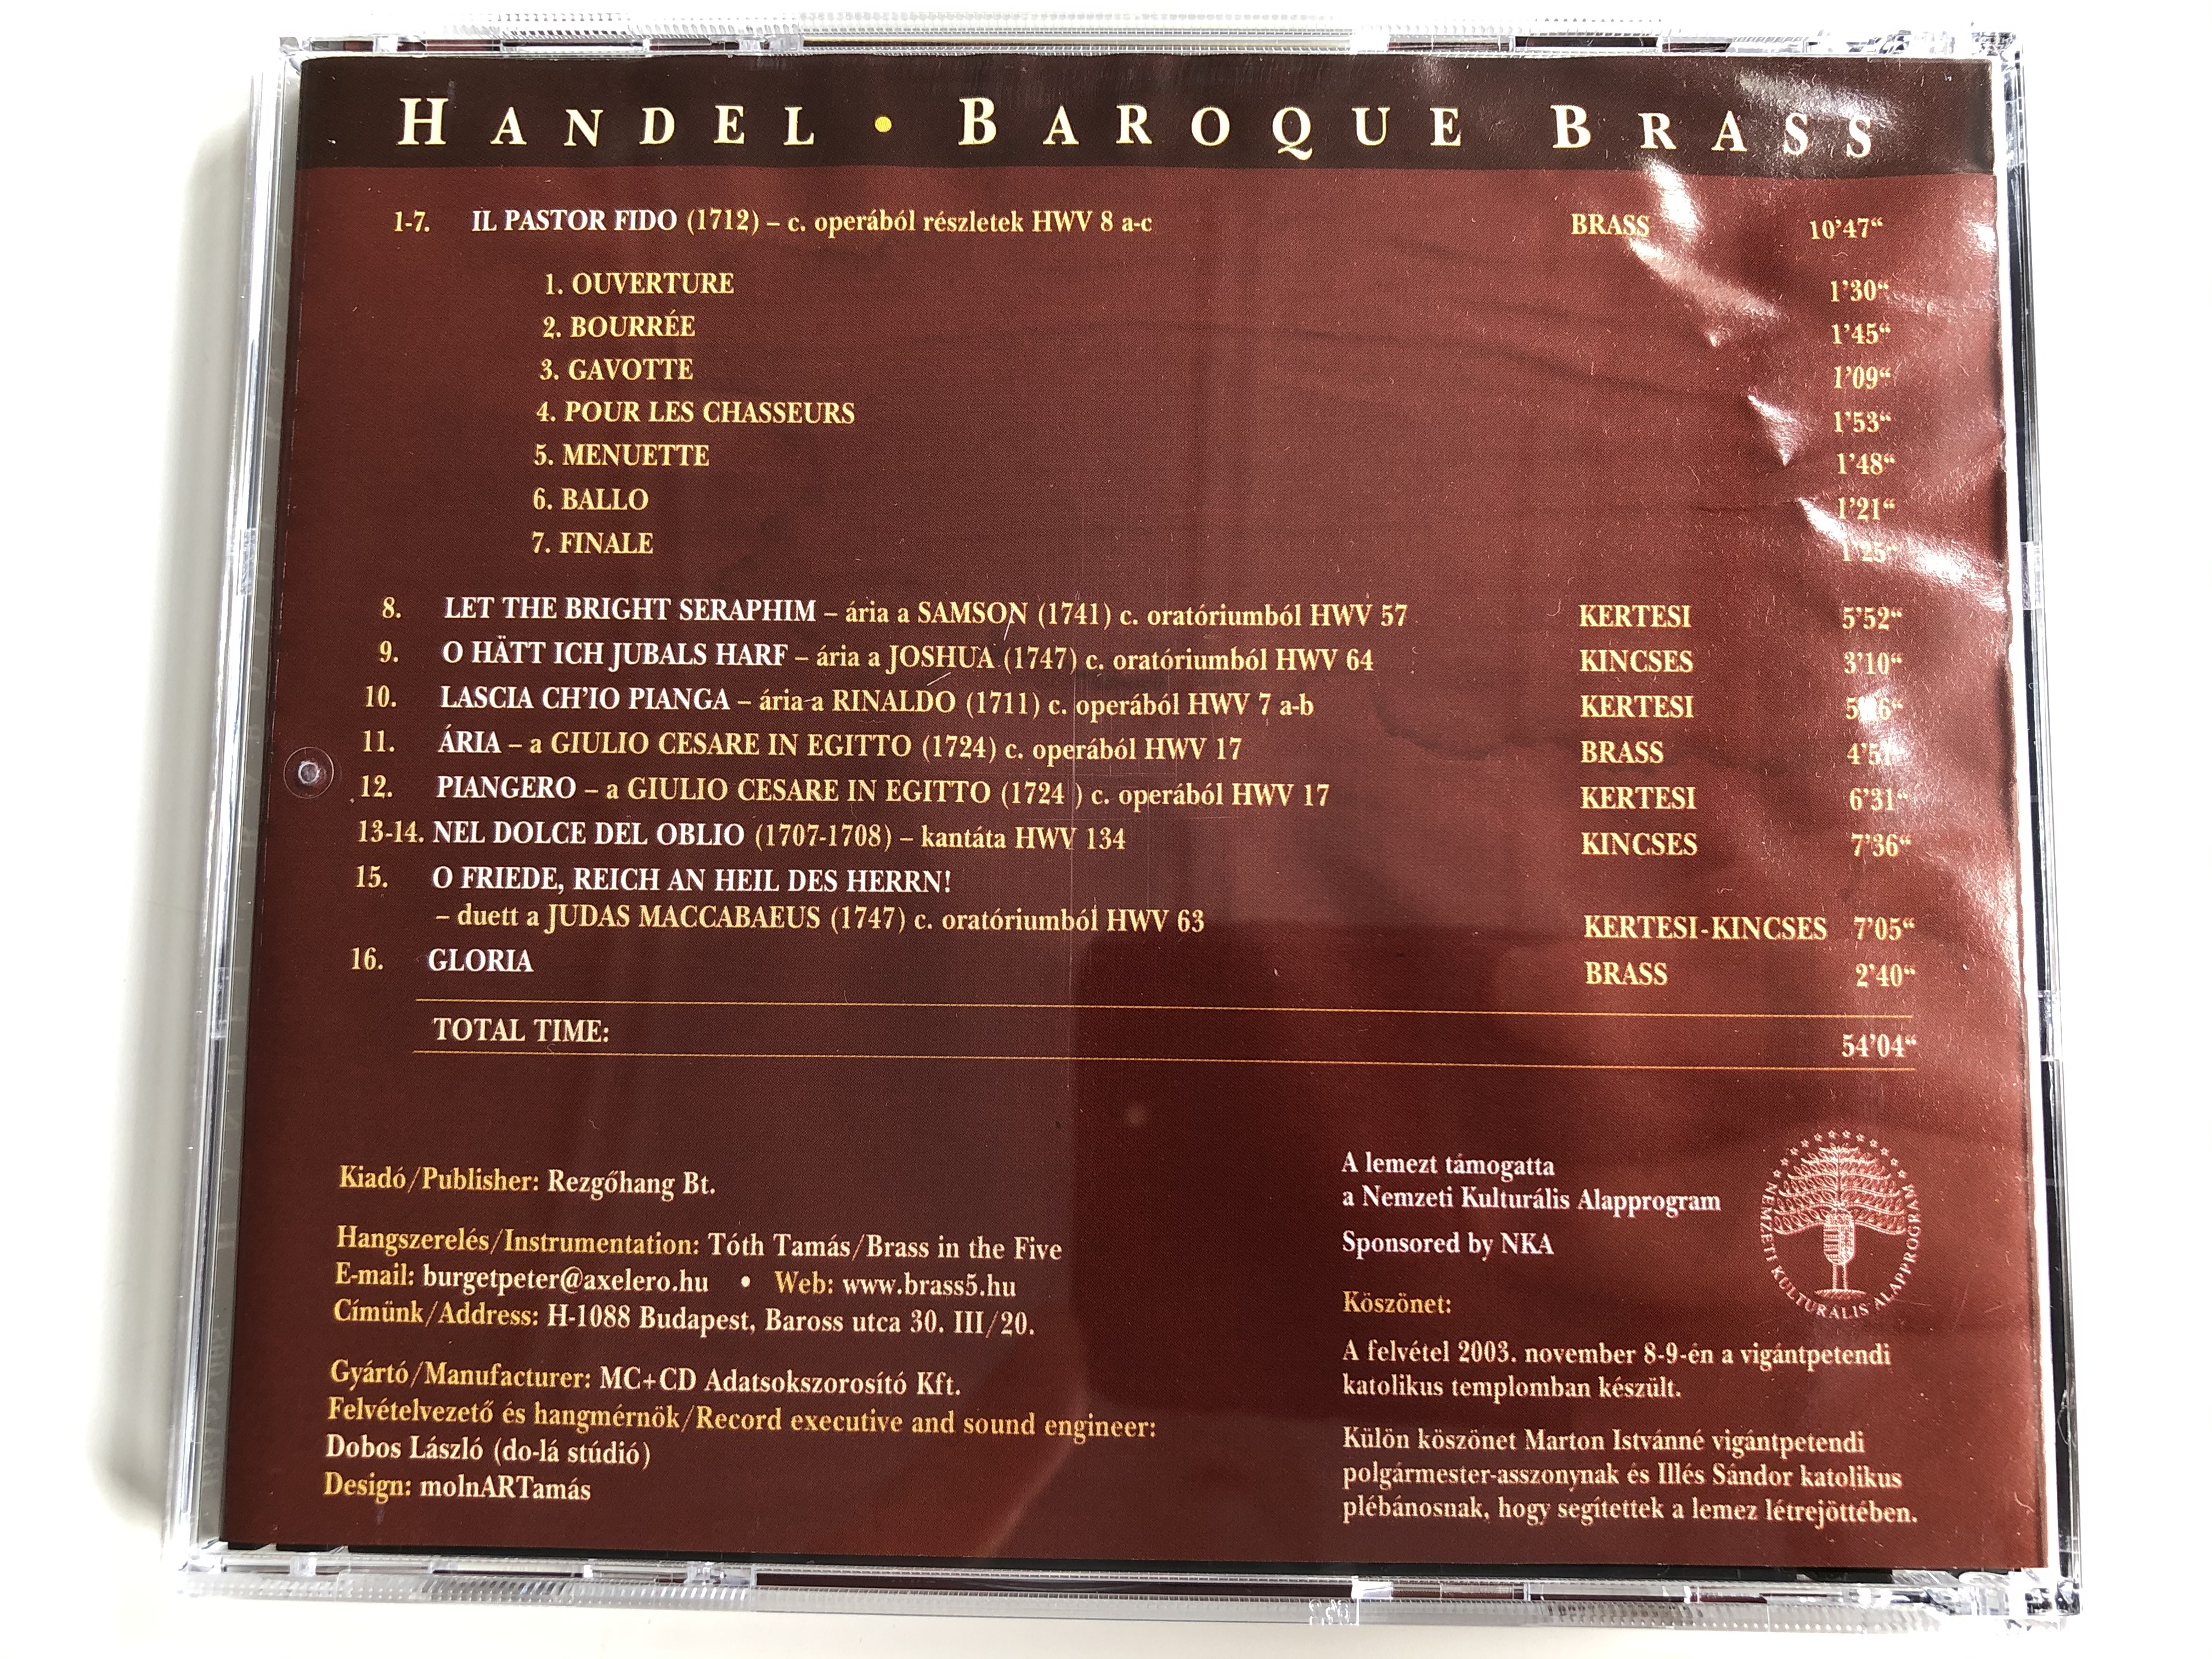 george-frideric-handel-baroque-brass-kertesi-ingrid-kincses-veronika-brass-in-the-five-brass-audio-cd-brass-008-9-.jpg